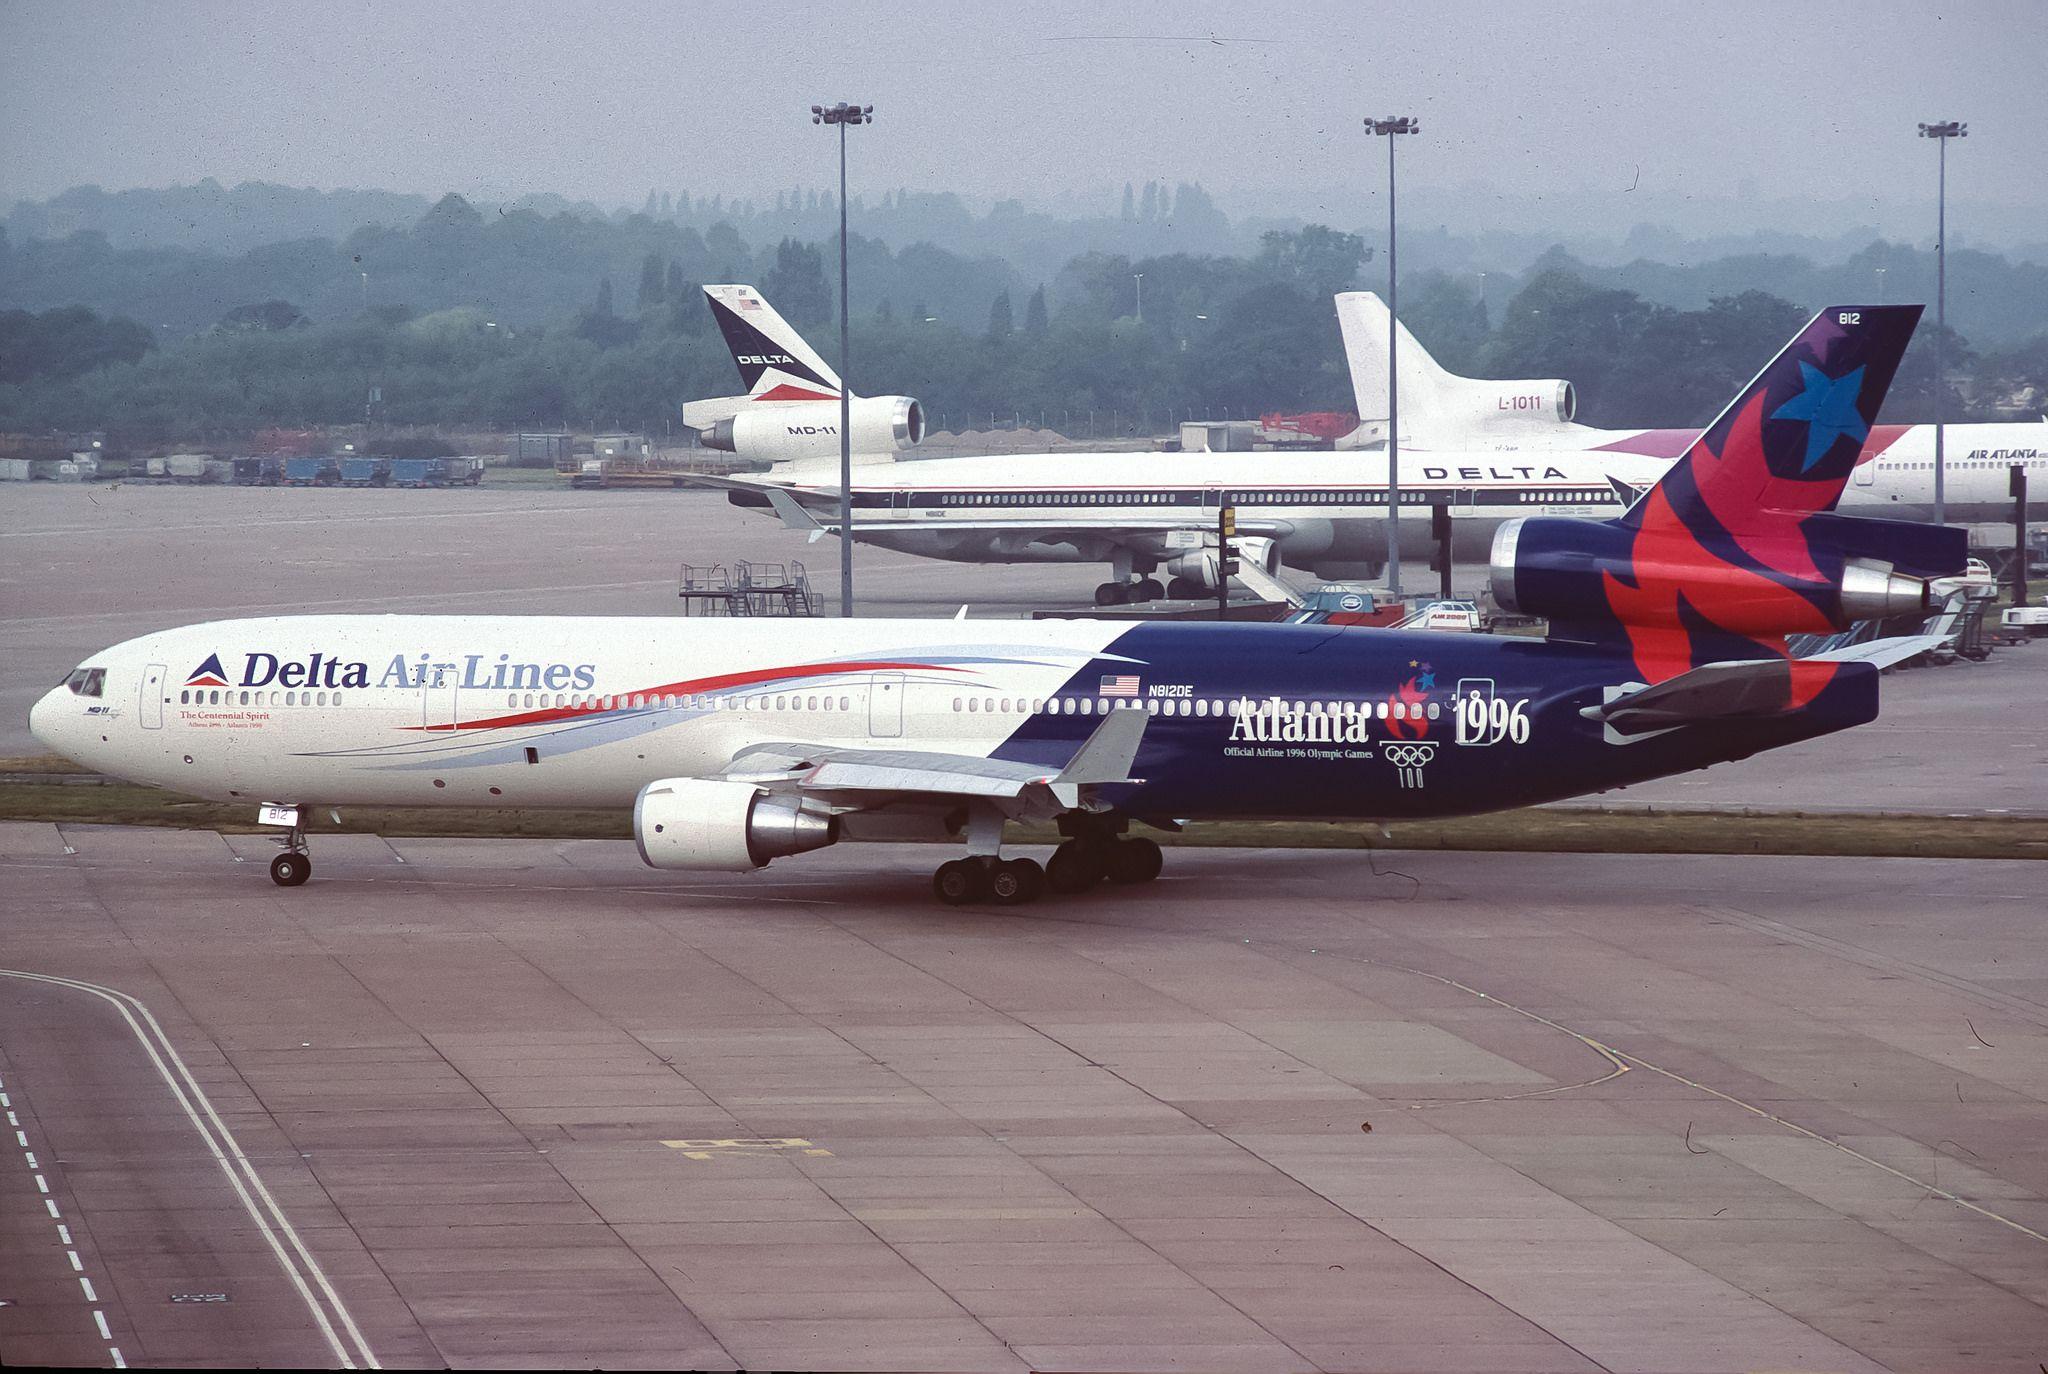 Delta airlines McDonnell Douglas MD11 (Atlanta 1996